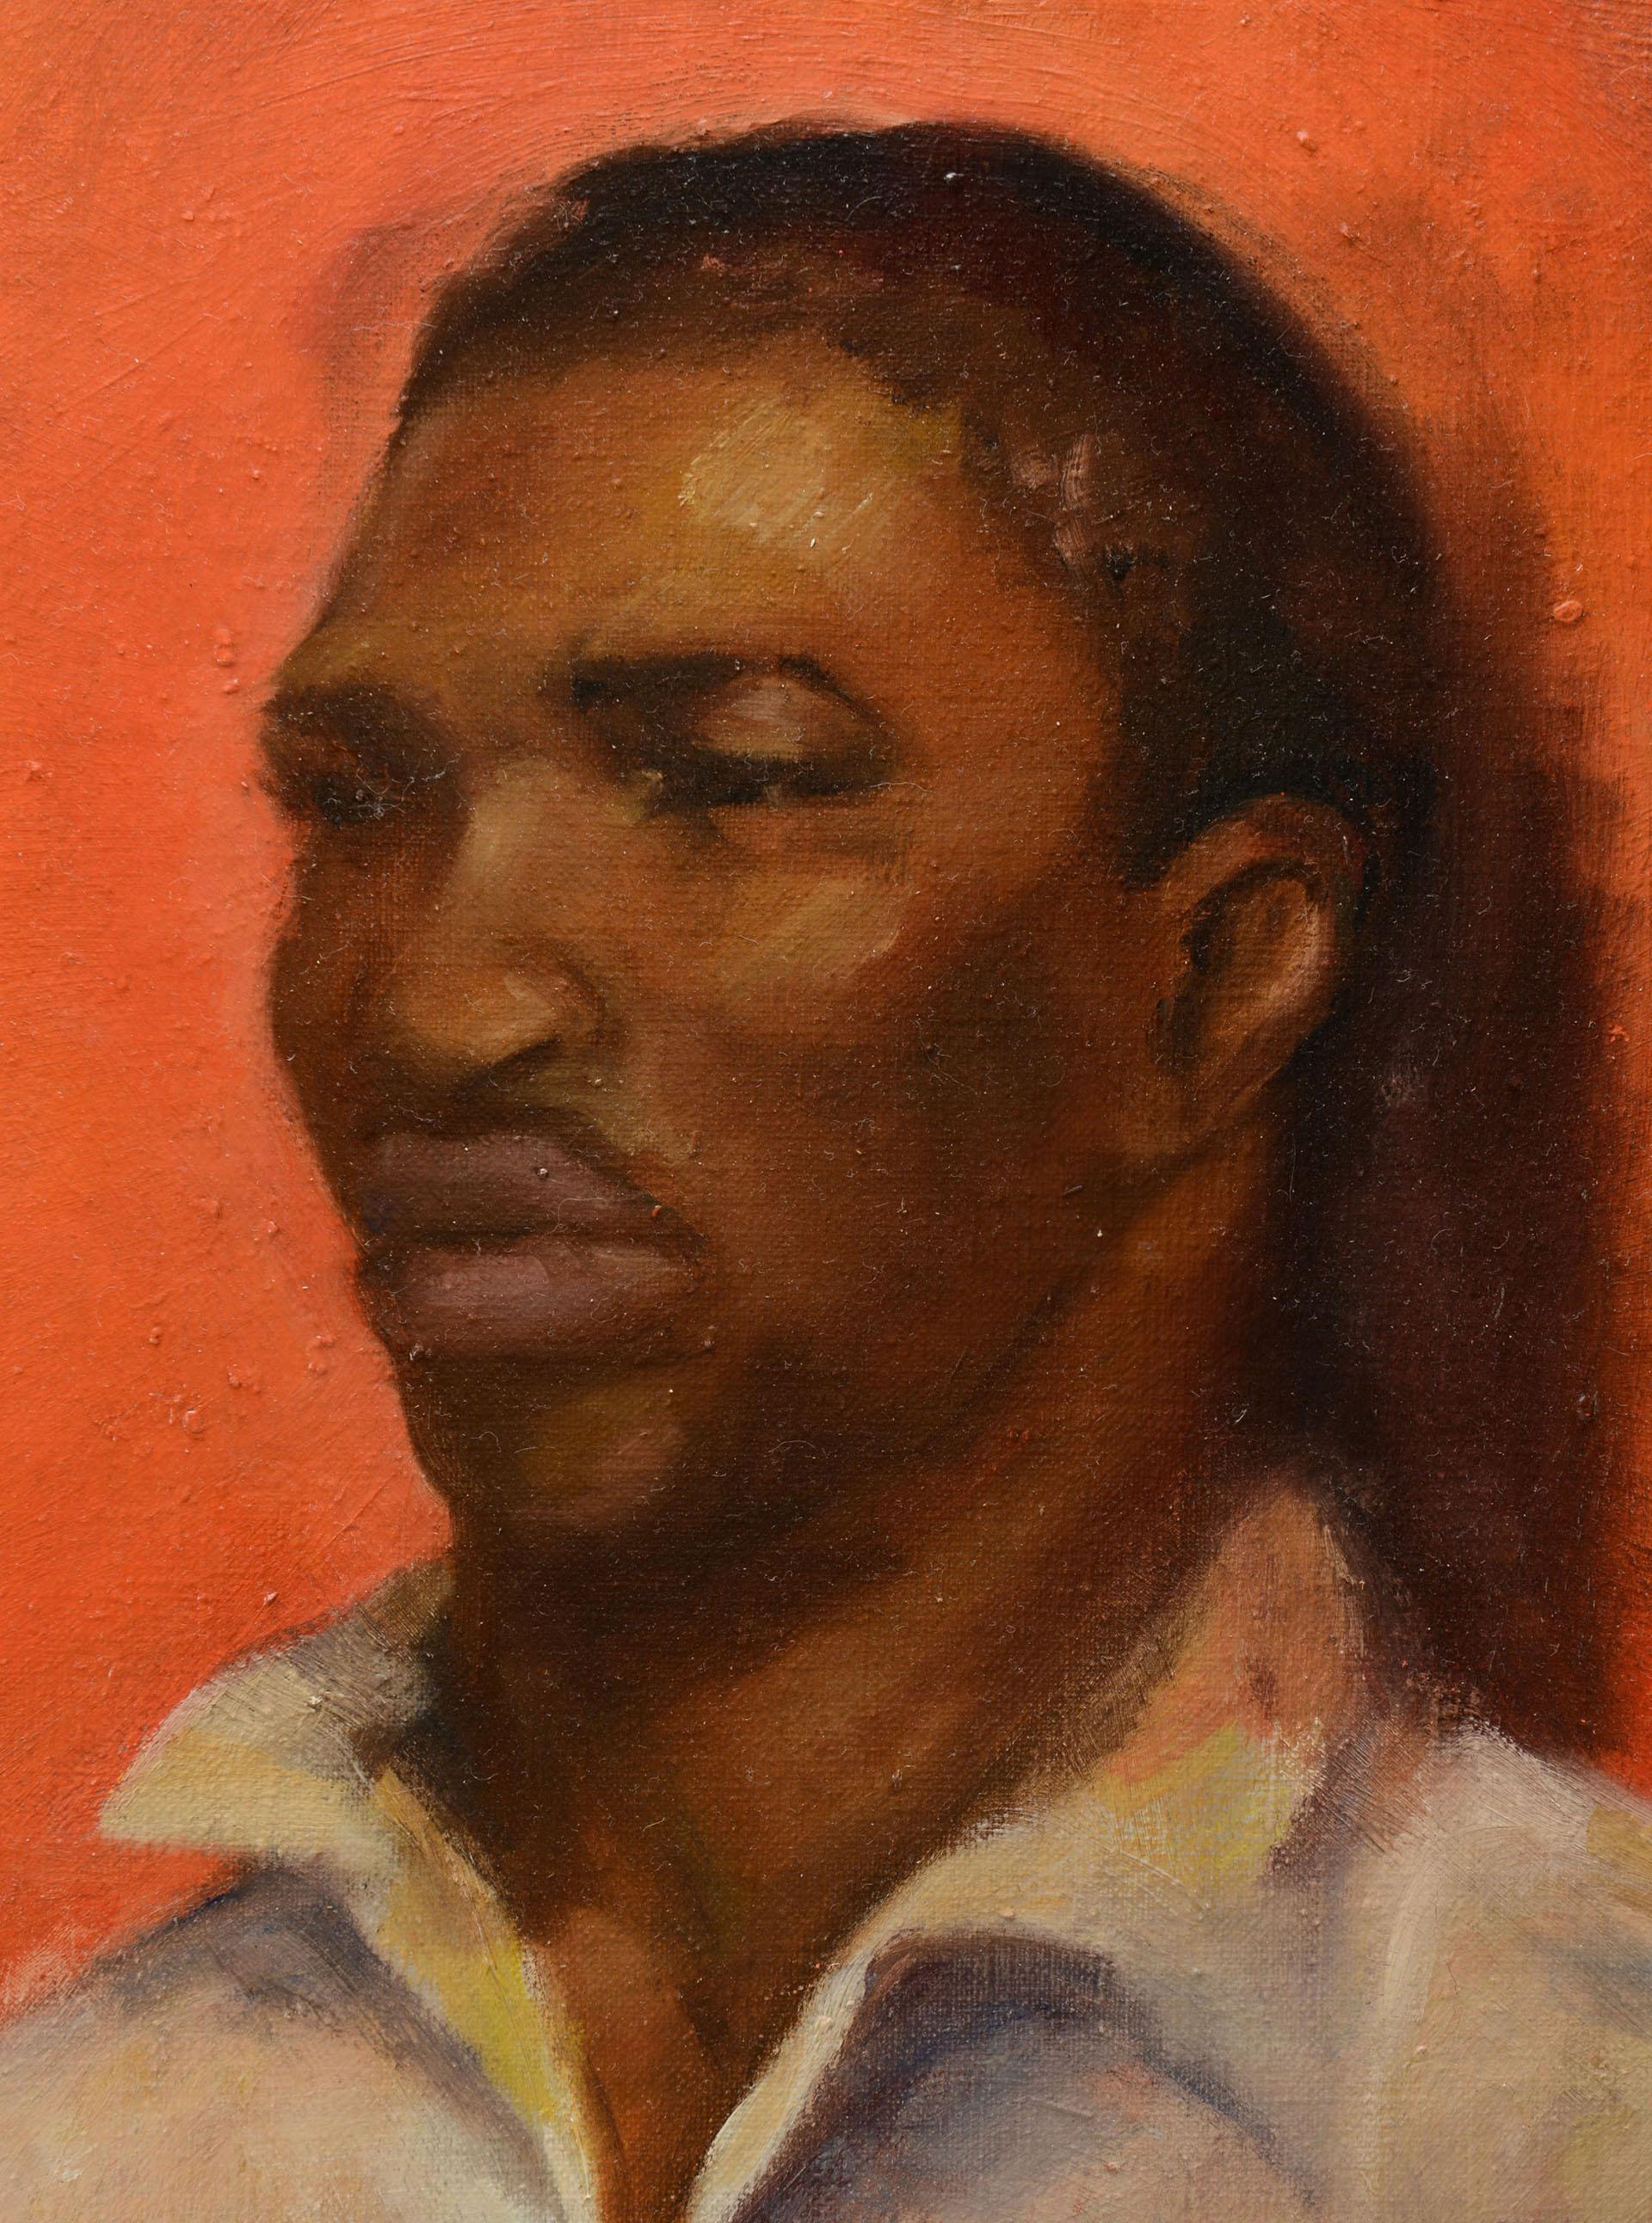 Oil On Canvas Portrait Of A Black Man